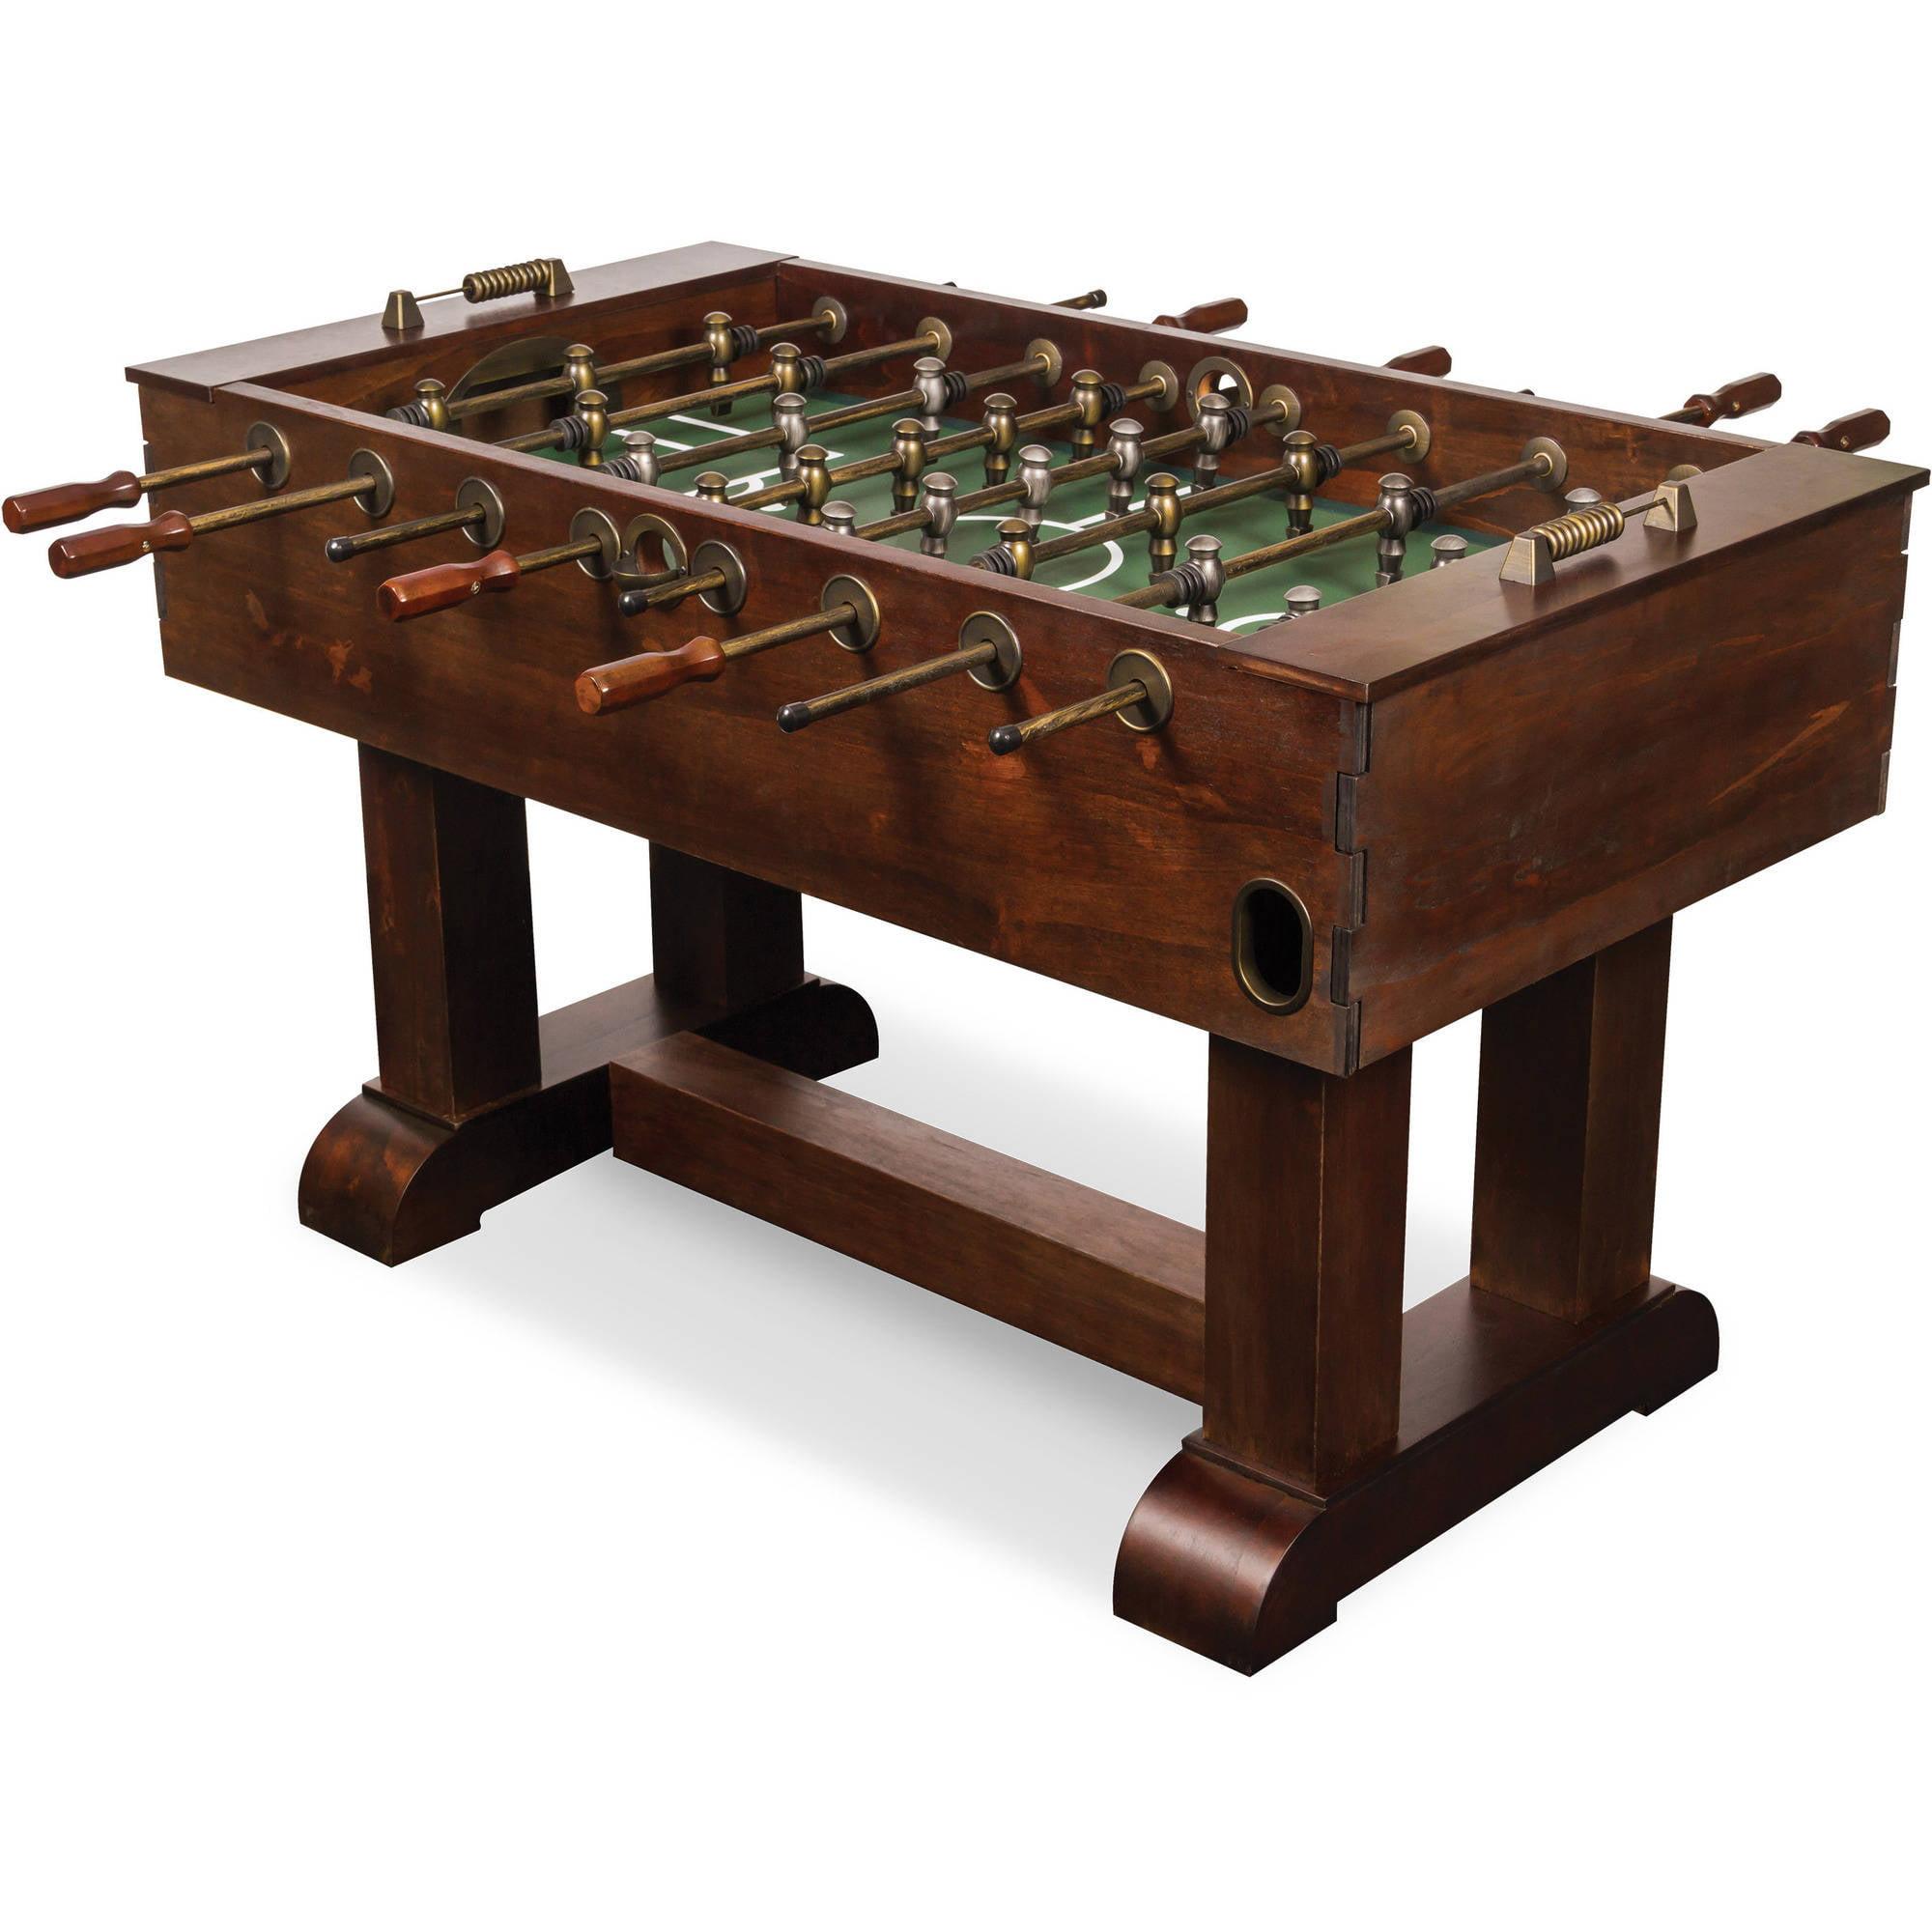 eastpoint sports eps 3000 tournament size table tennis table rh walmart com